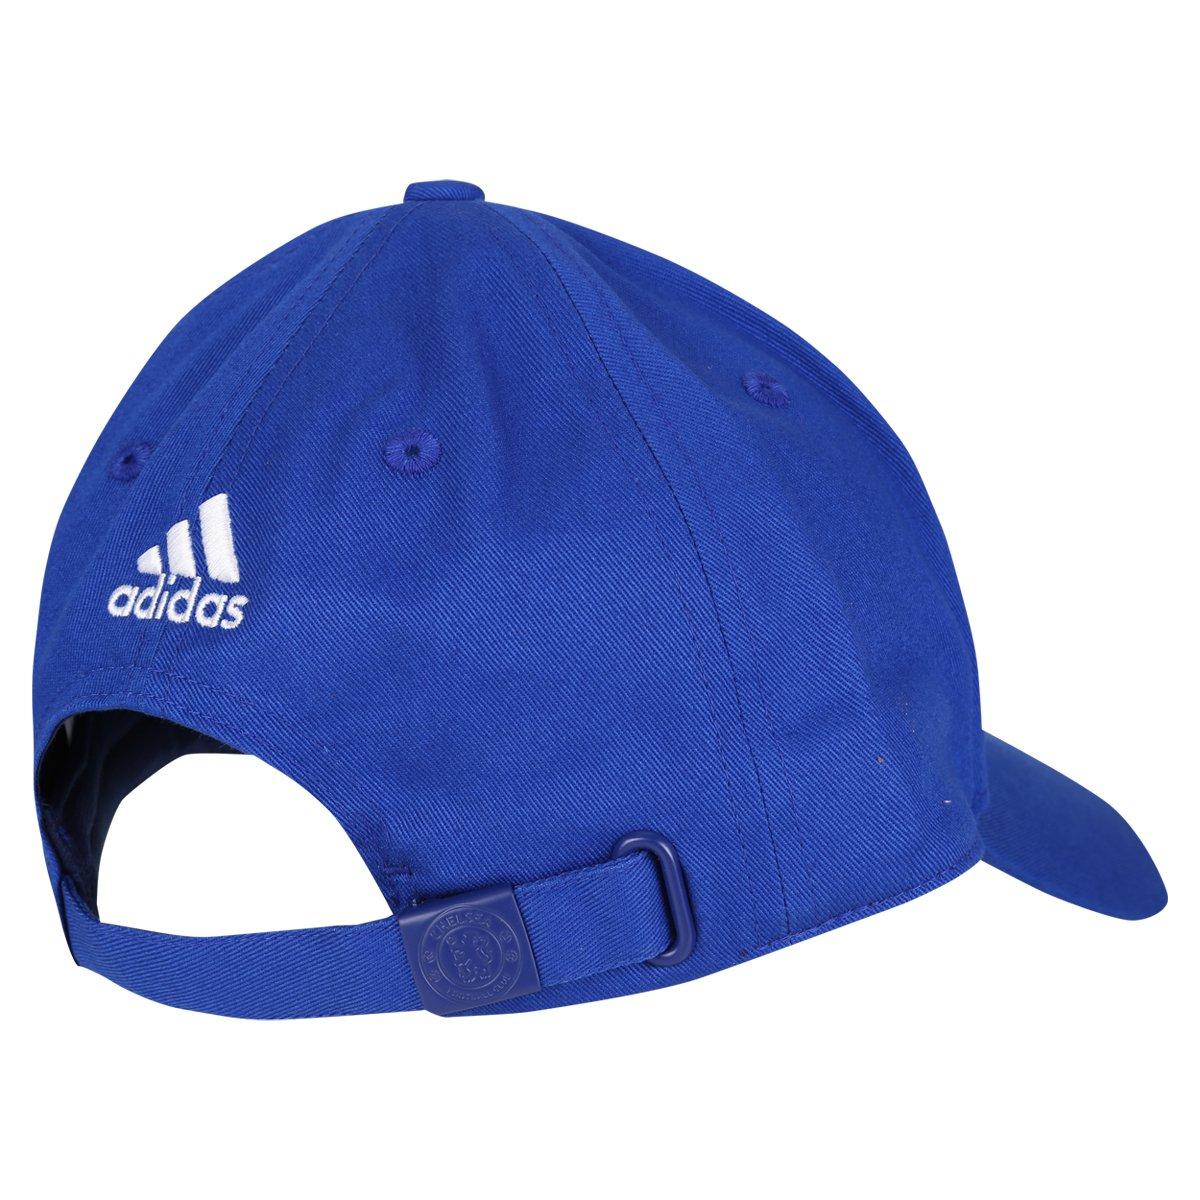 602ef01d56 Boné Chelsea Adidas Aba Curva 3S - Compre Agora